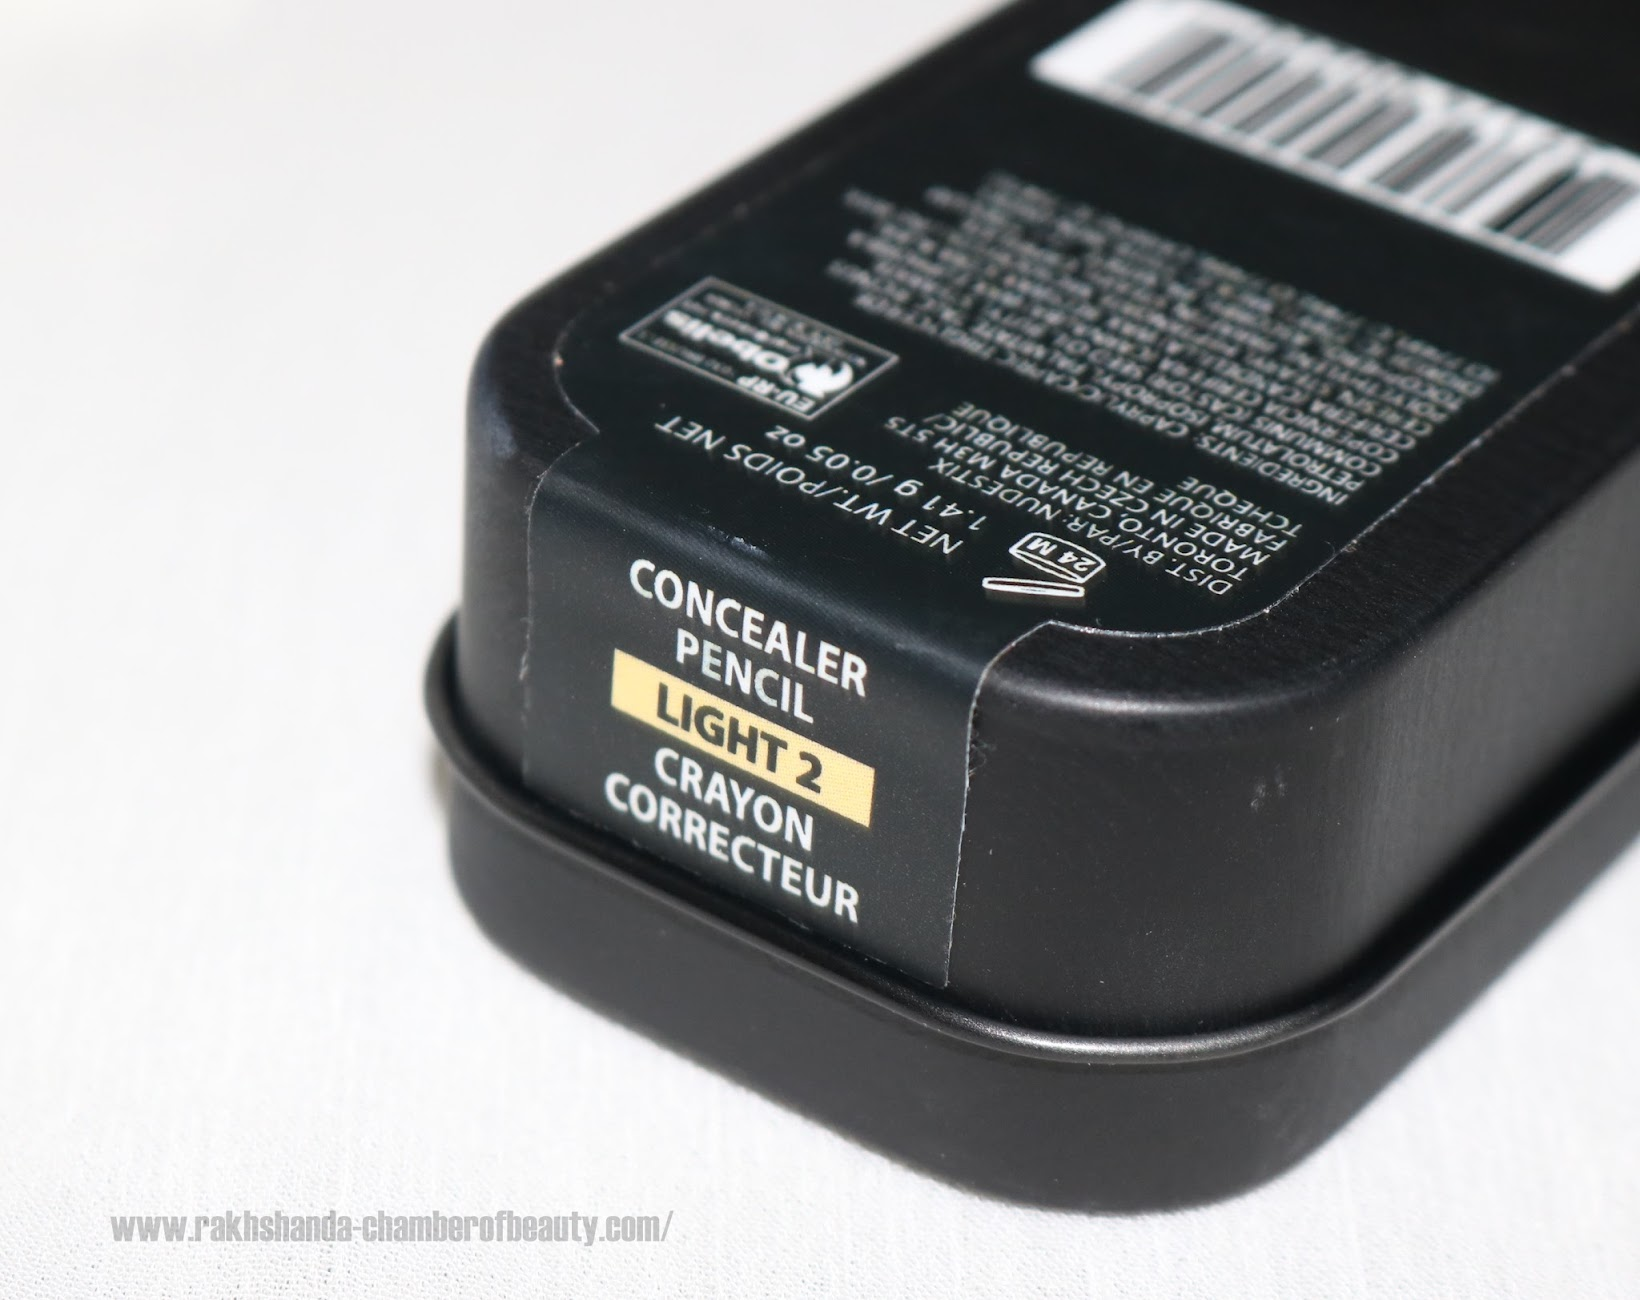 Nudestix Concealer Pencil 'Light 2' review, swatches, best concealers for fair skin, concealer, Indian beauty blogger, Nudestix, Nudestix Concealer Pencil review, review, review and swatches,